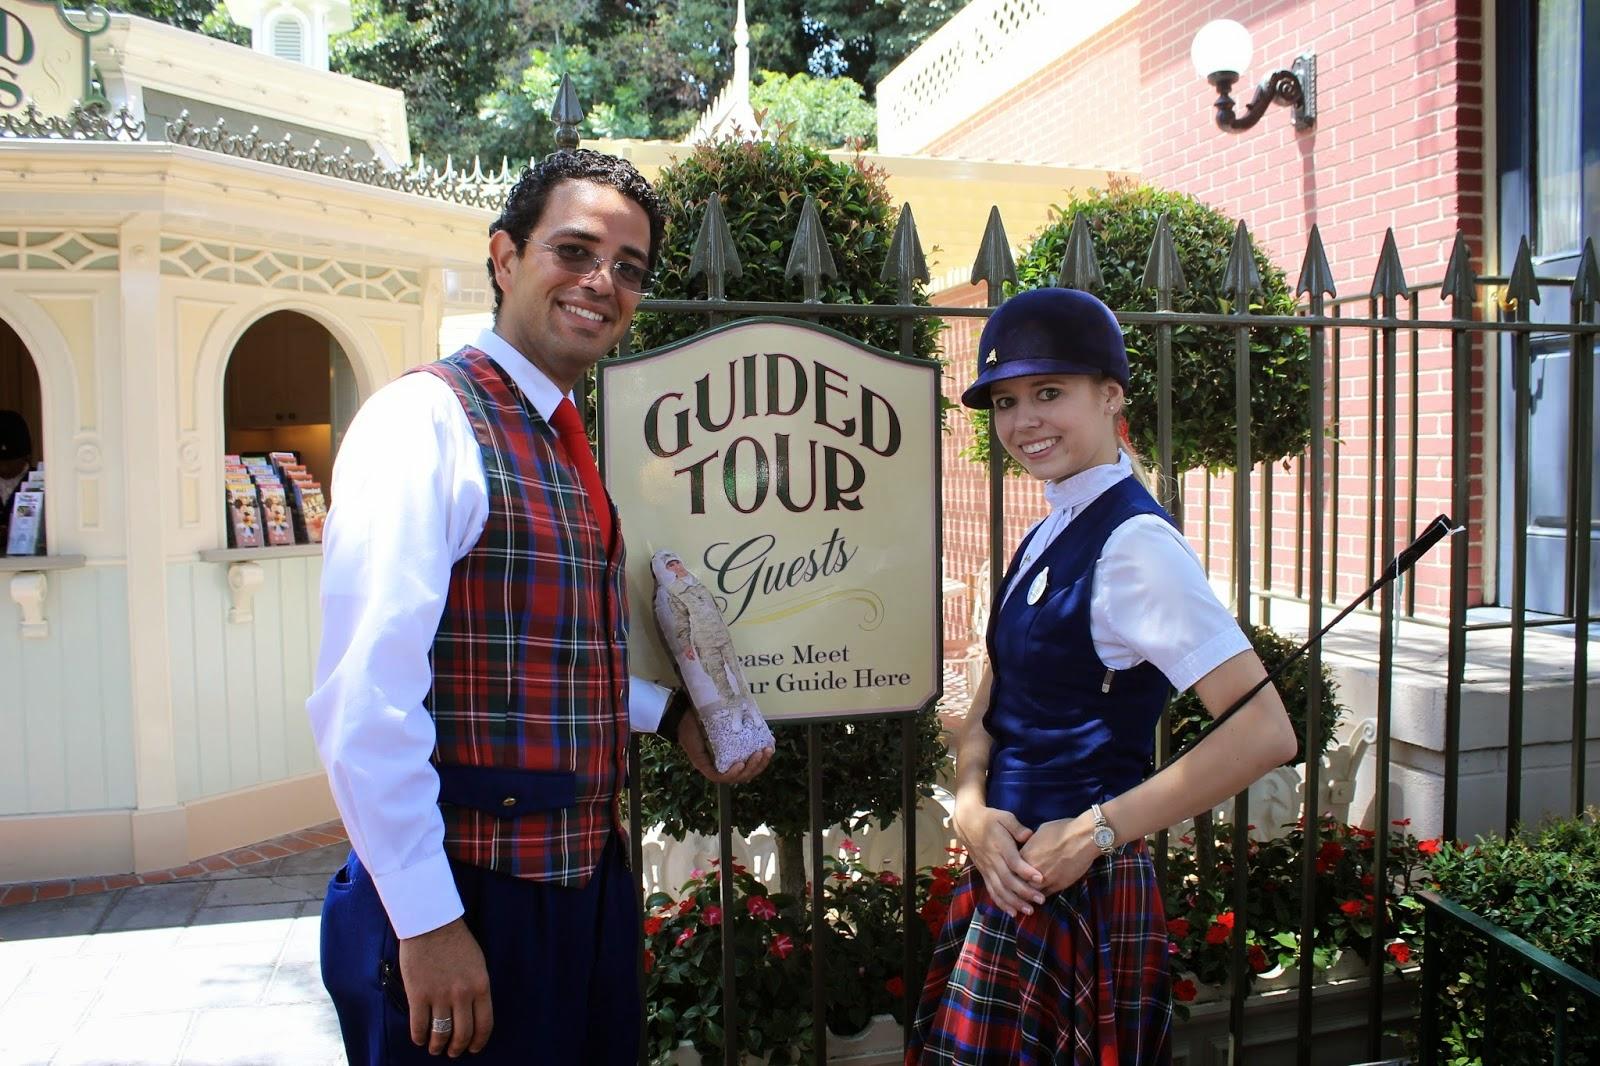 visiting Walt Disney World filmprincesses.filminspector.com